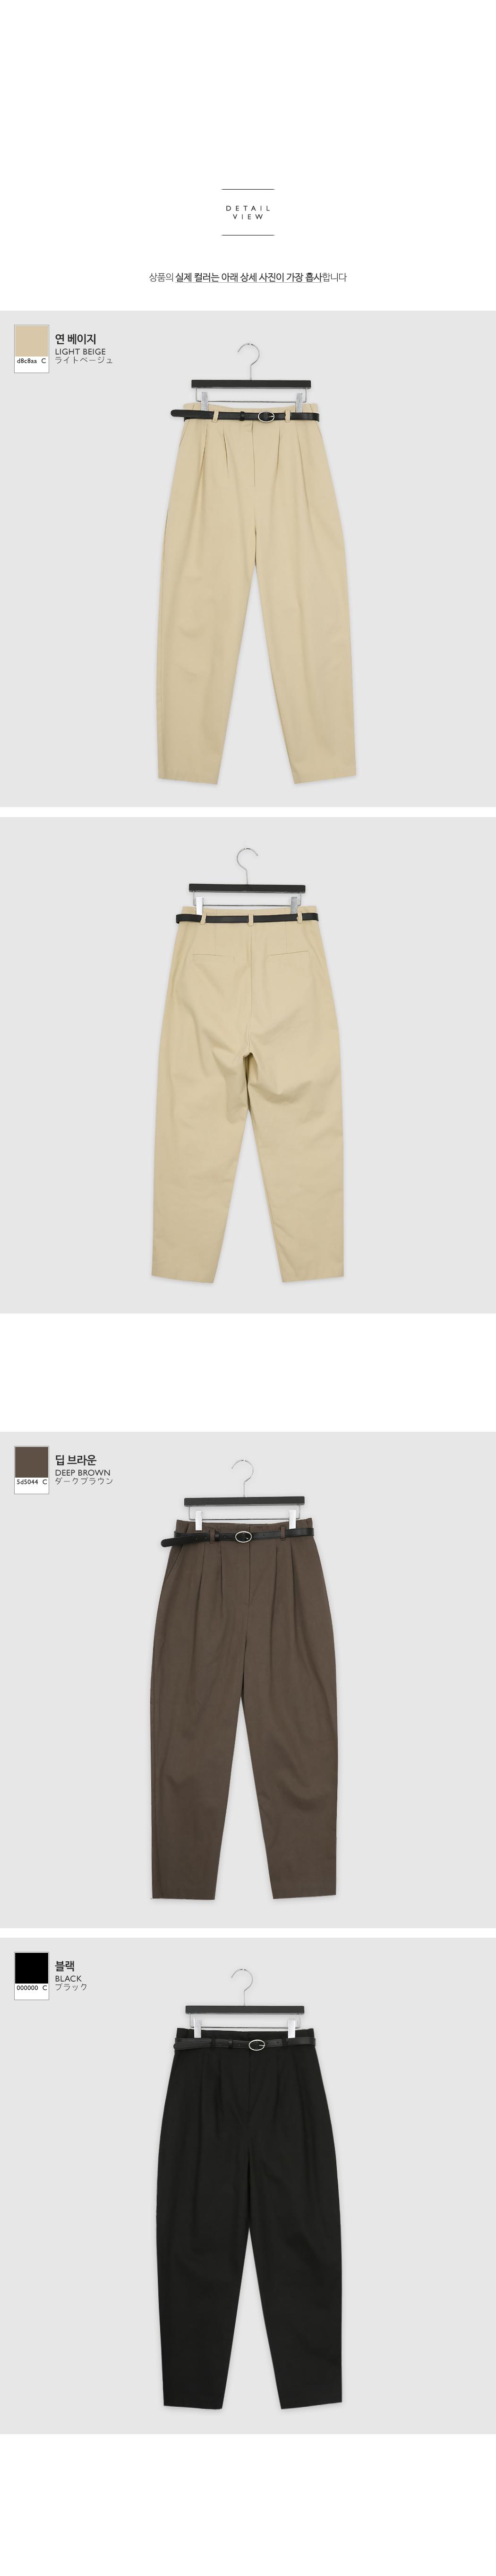 Cotton pin tuck exhaust pants